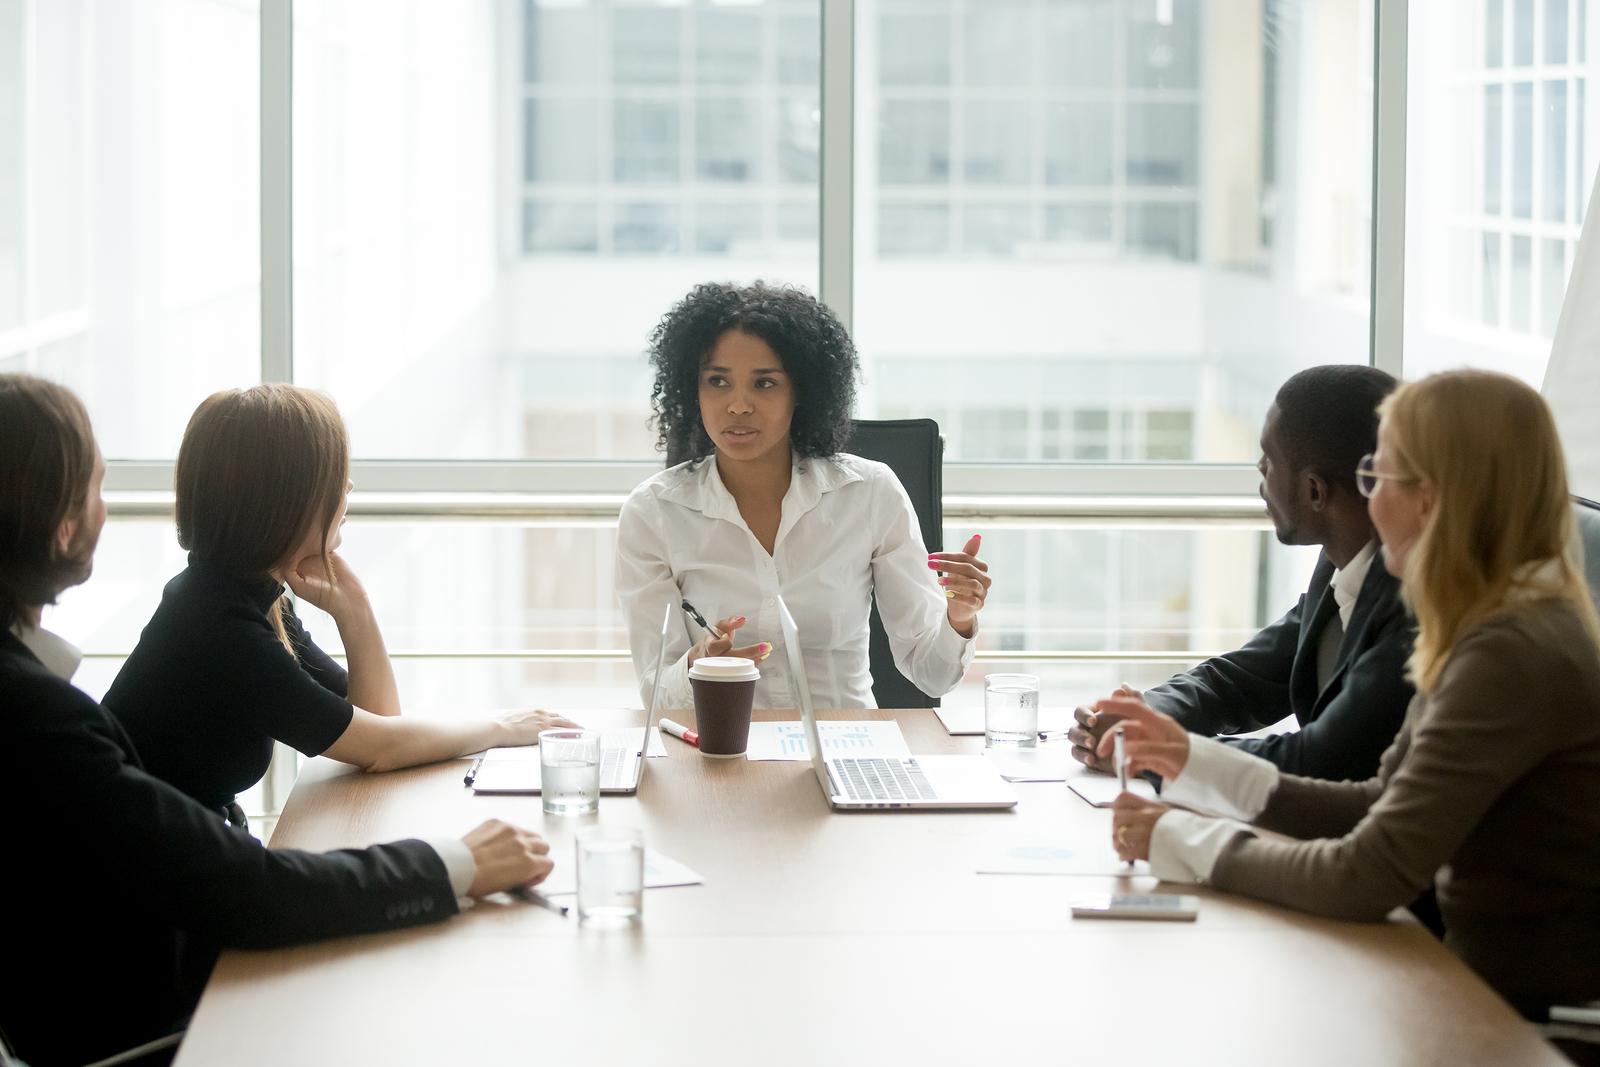 Customer service leader facilitating a team meeting.